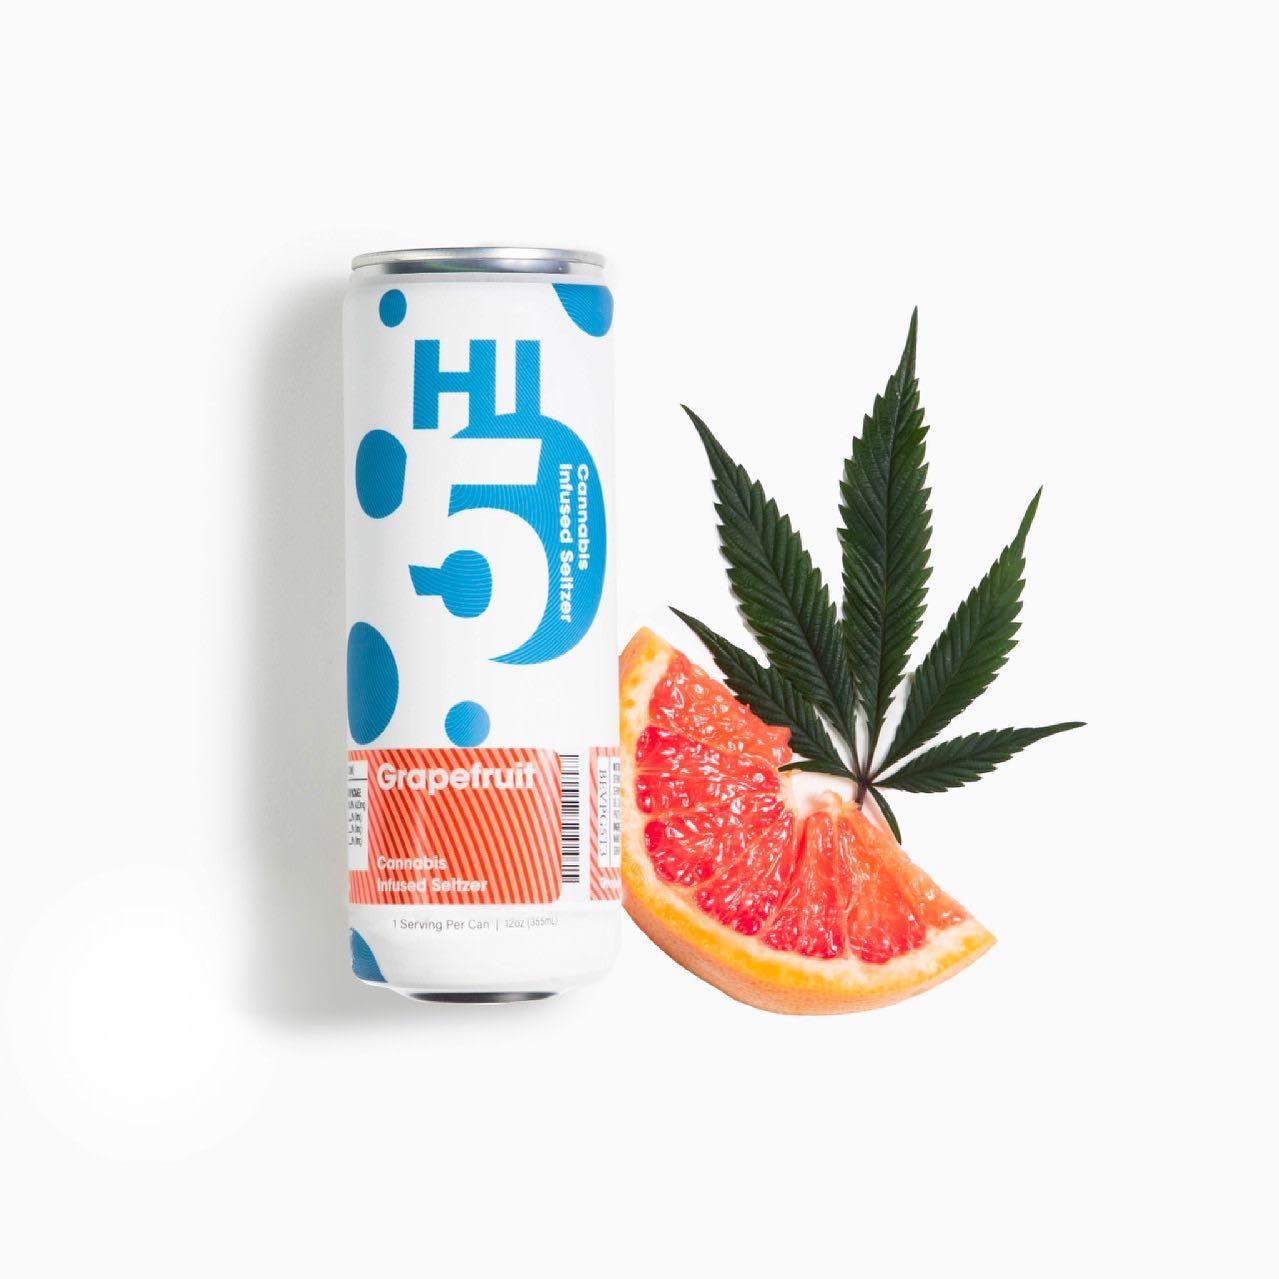 Hi5-Grapefruit-Cannabis-Infused-Seltzer